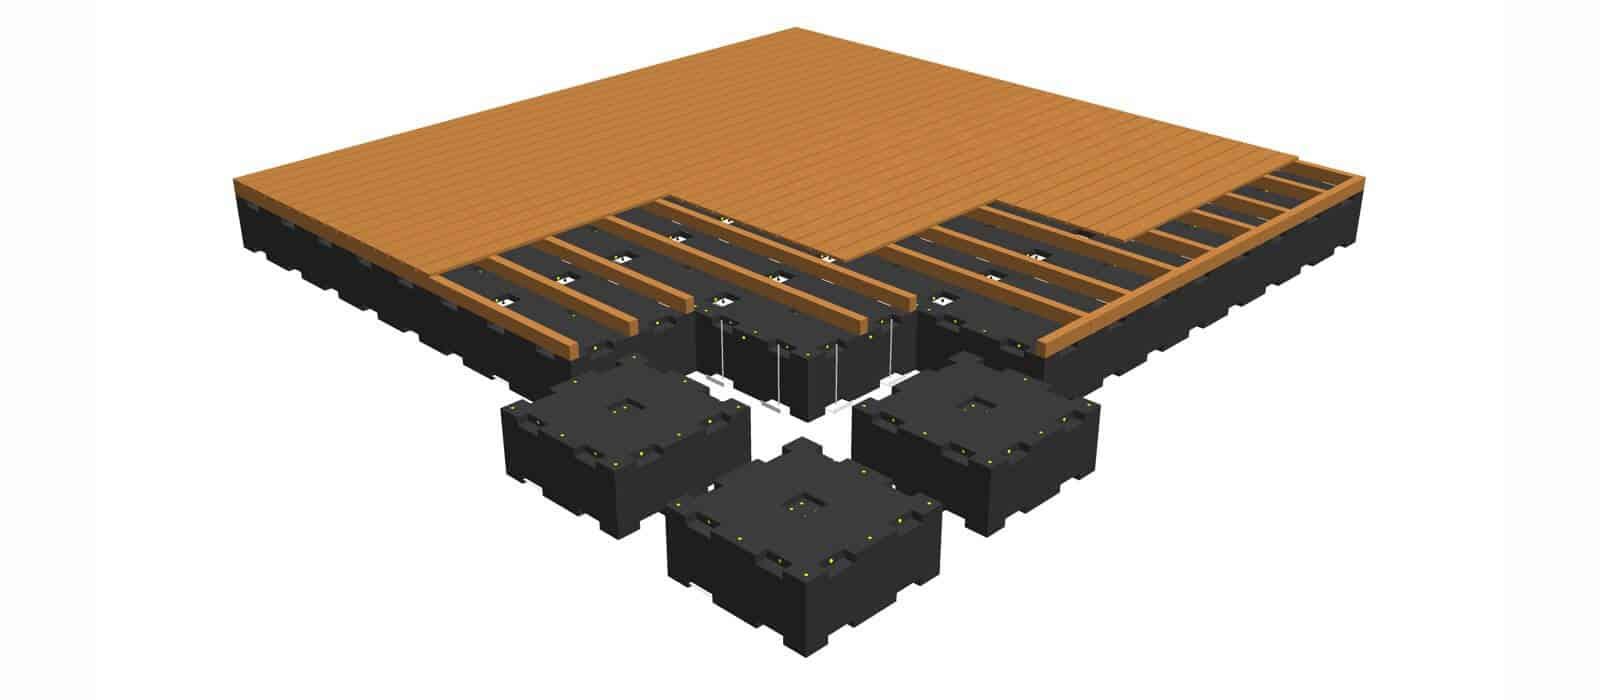 Configurator Floating Platforms